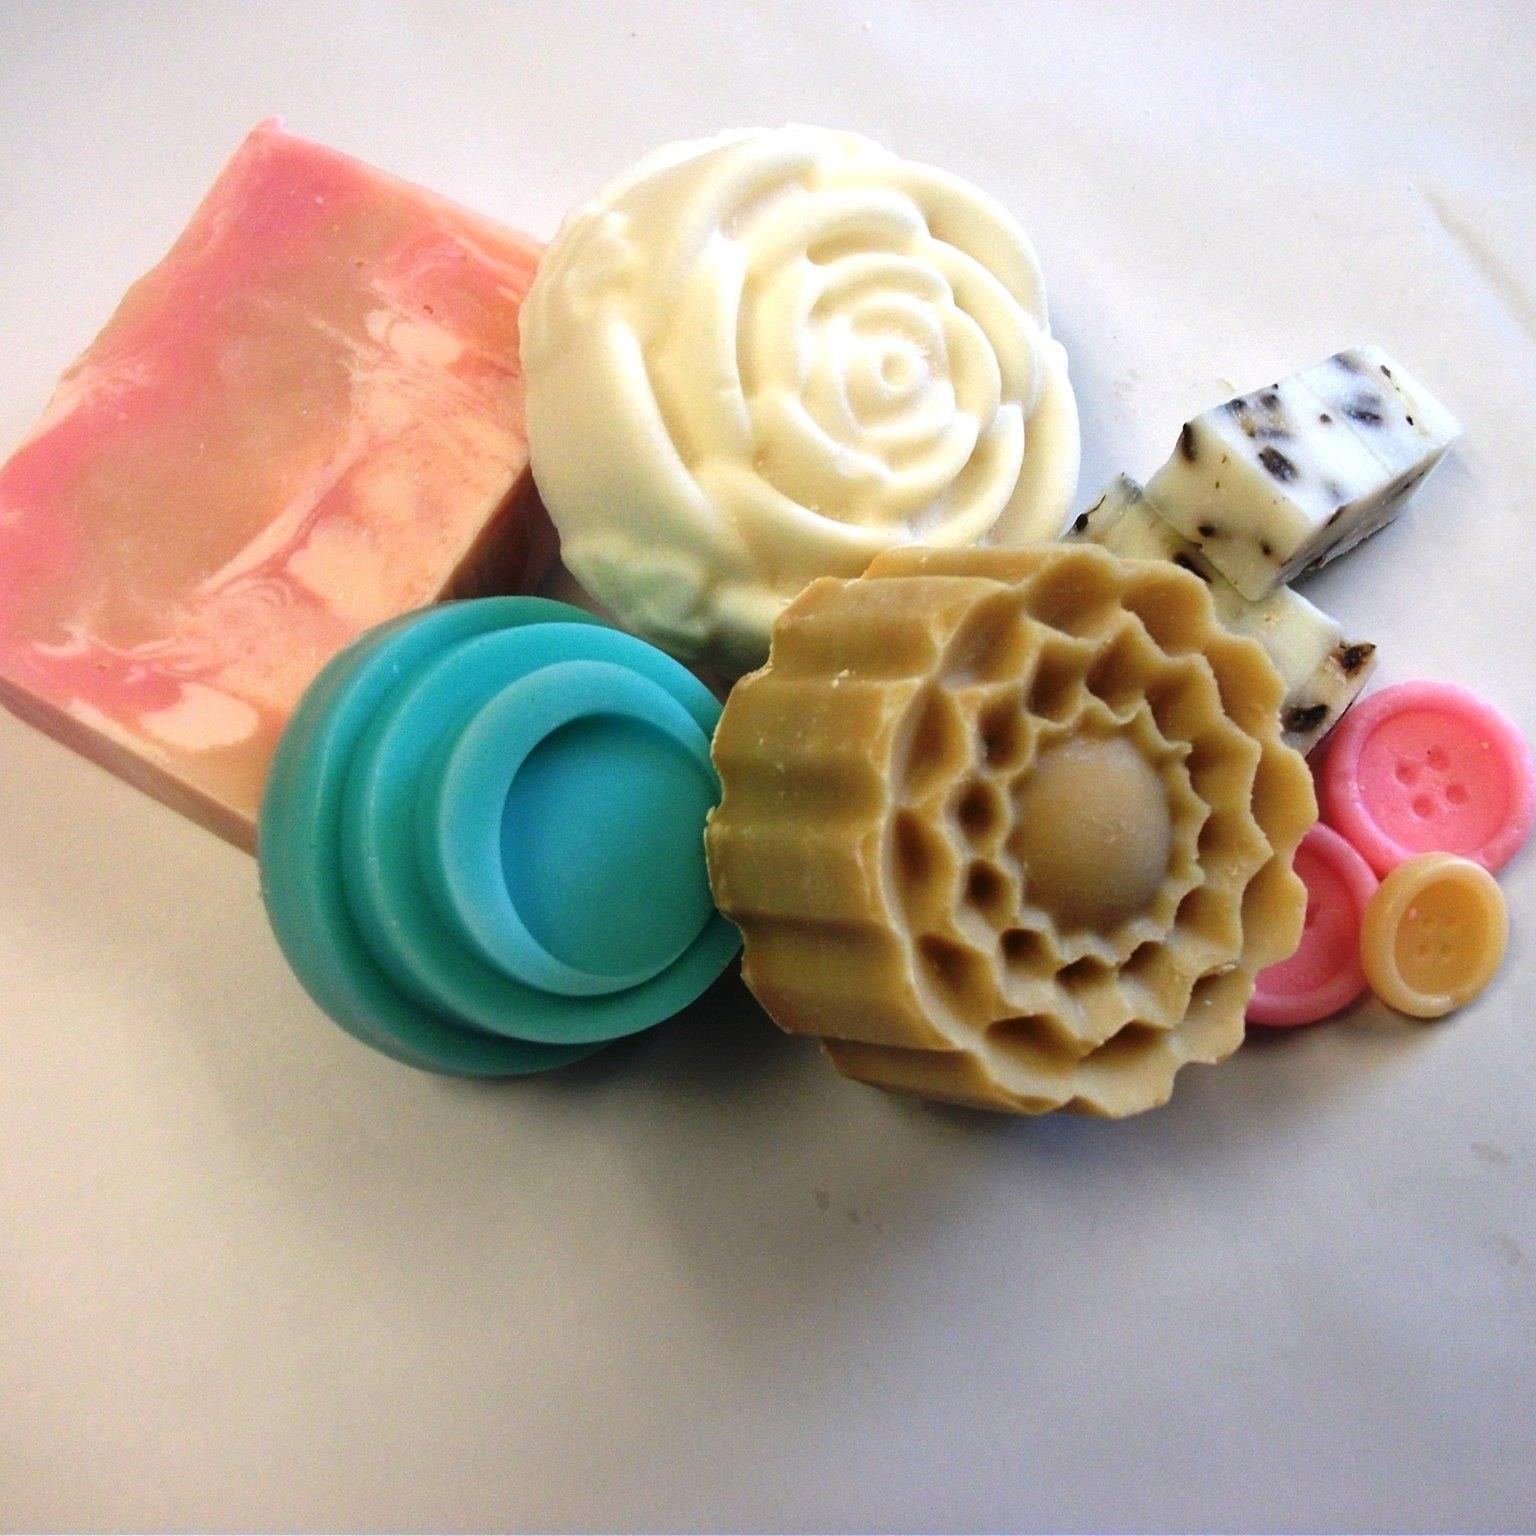 soap making.jpeg